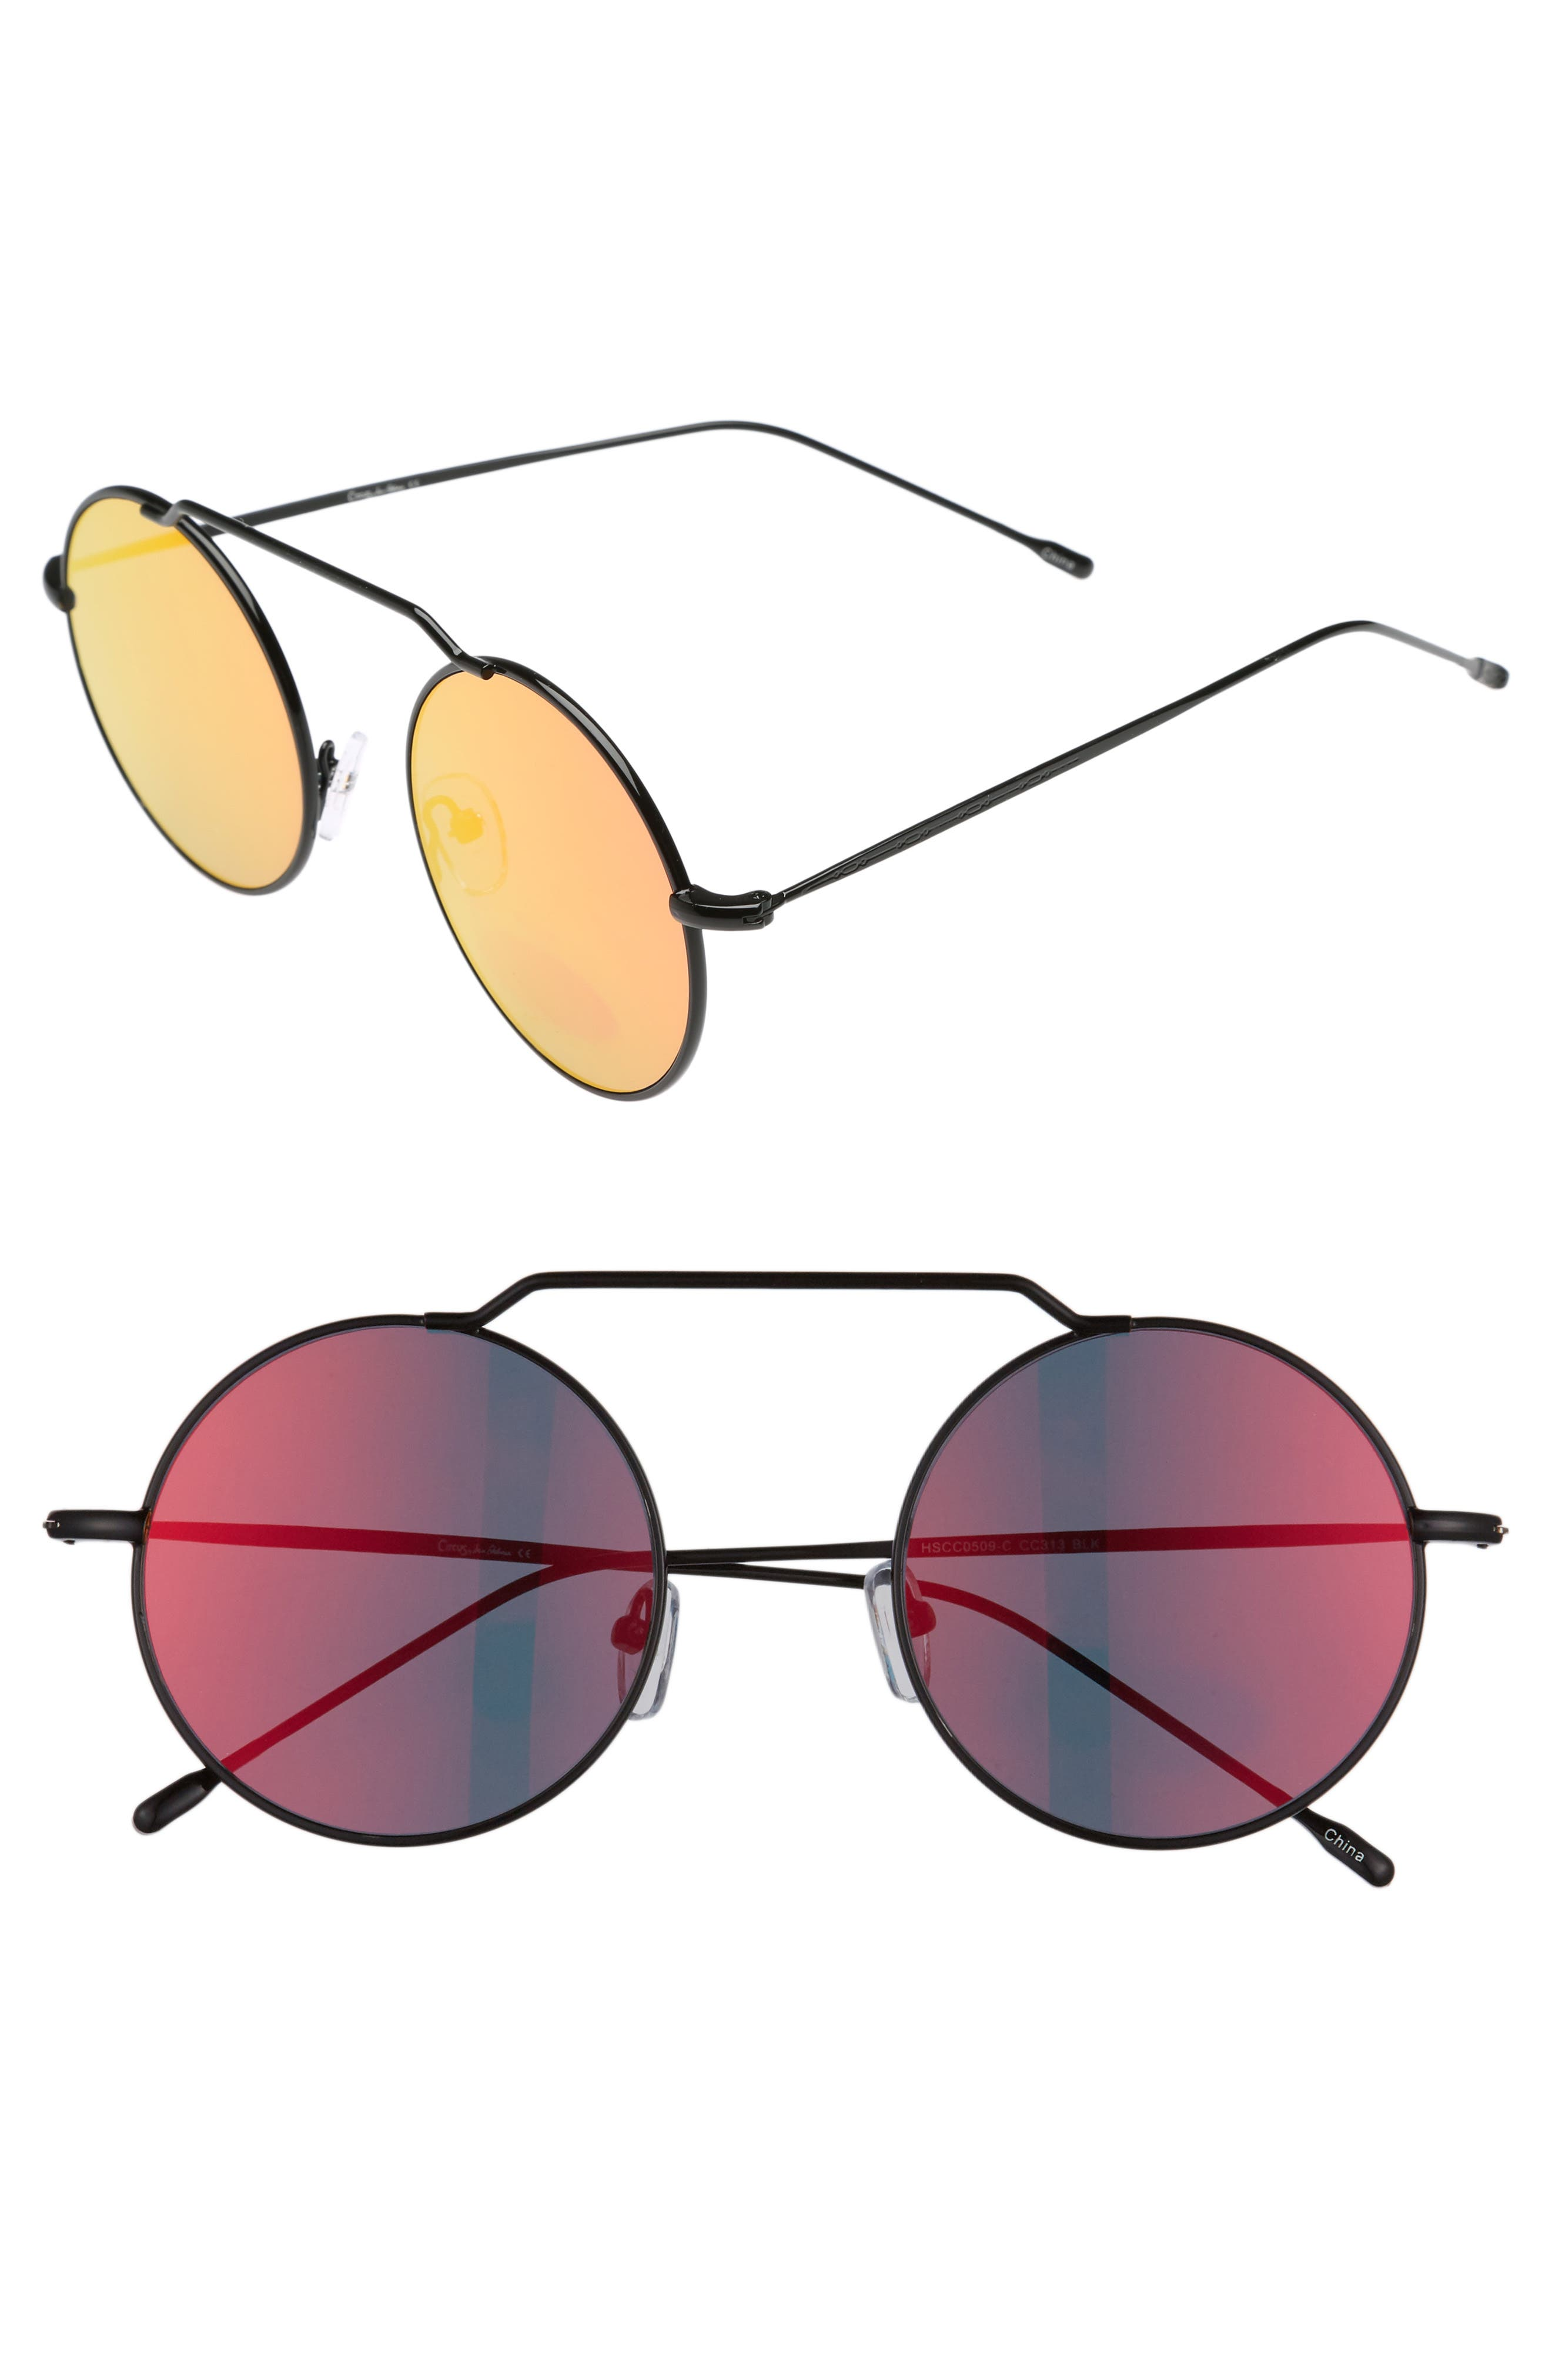 51mm Brow Bar Round Sunglasses,                             Main thumbnail 1, color,